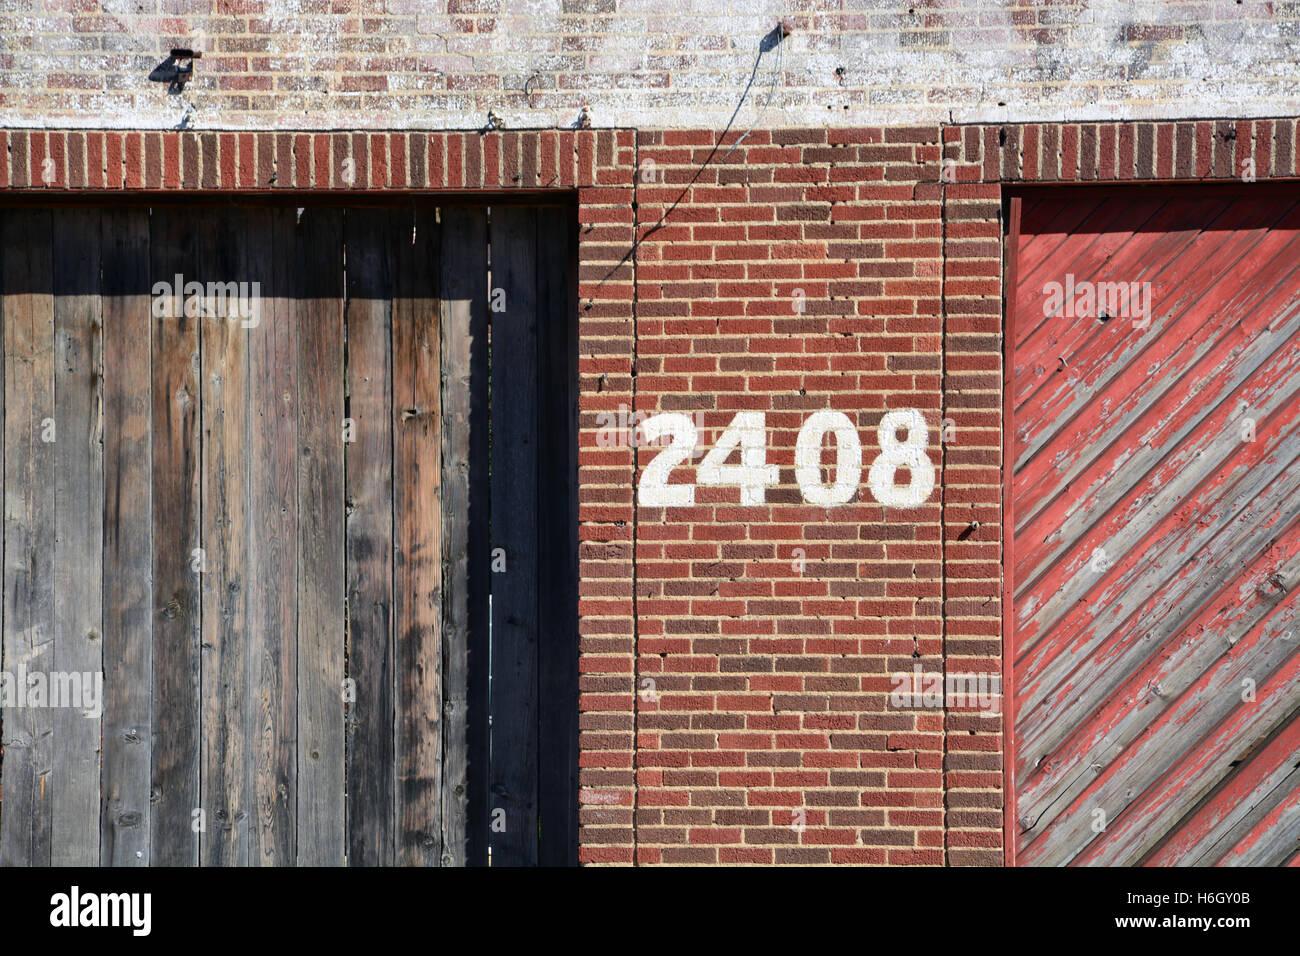 Address 2408 - Stock Image